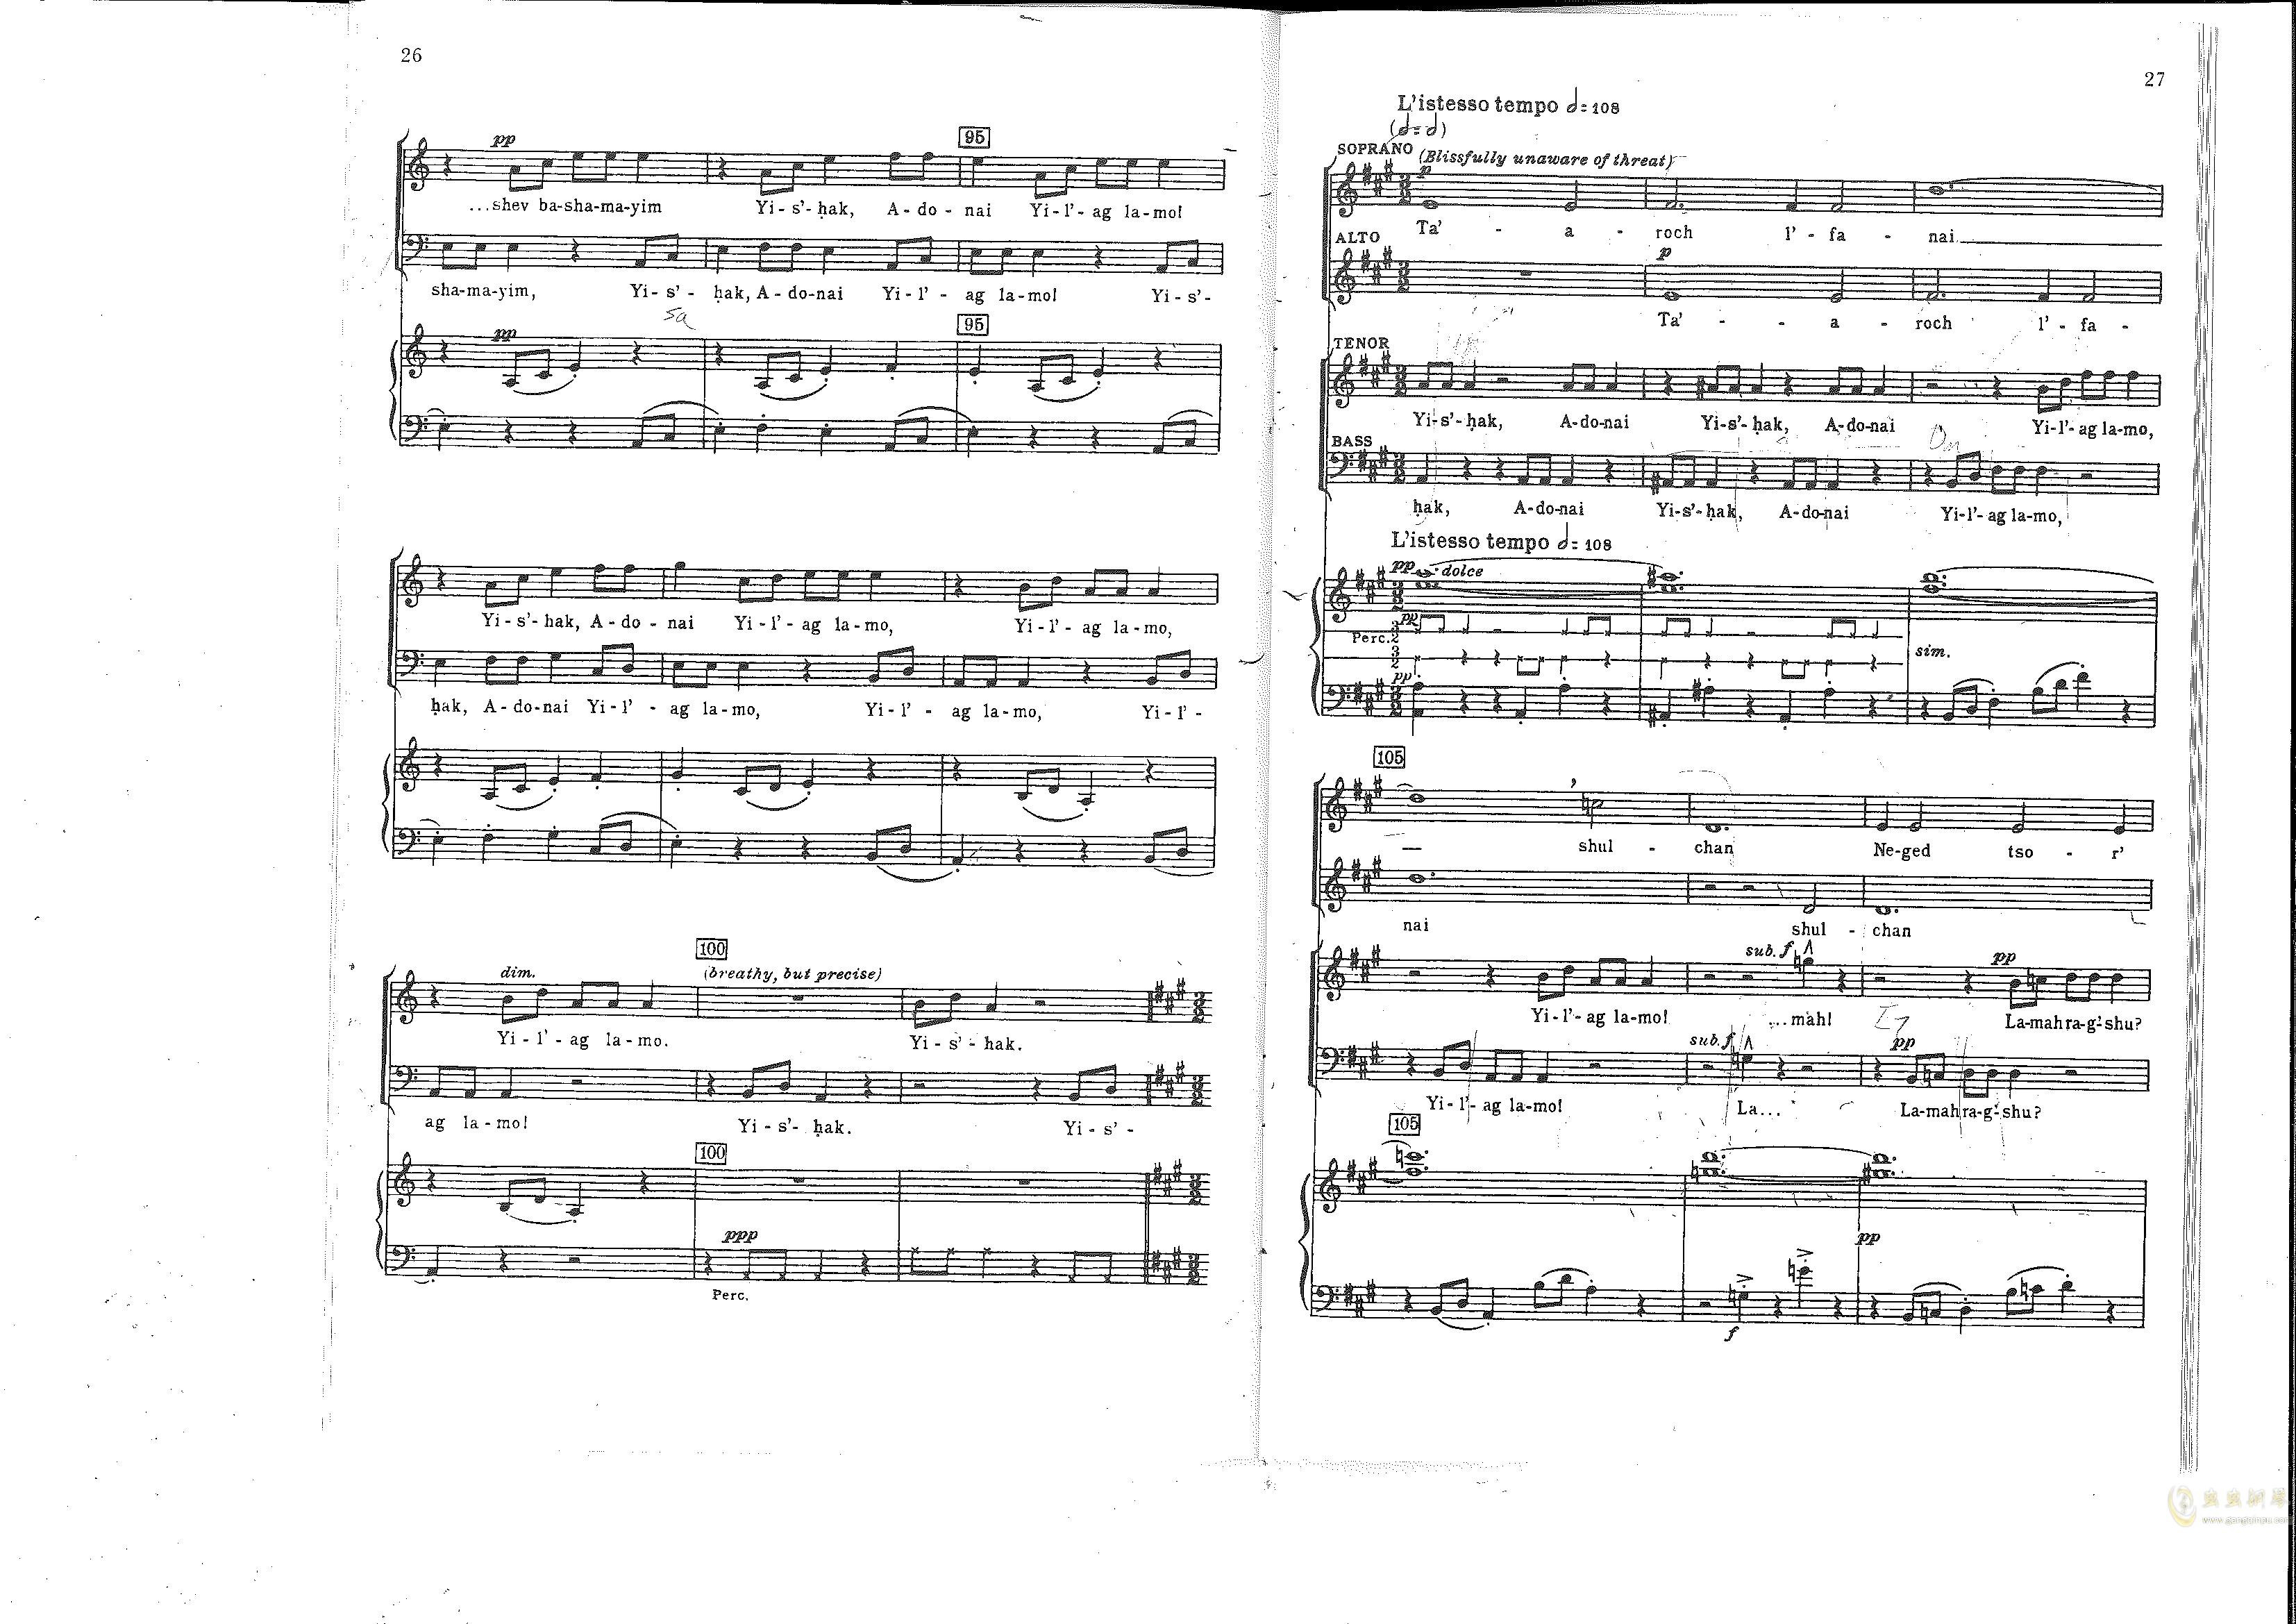 Chichester Psalms澳门星际官网 第17页